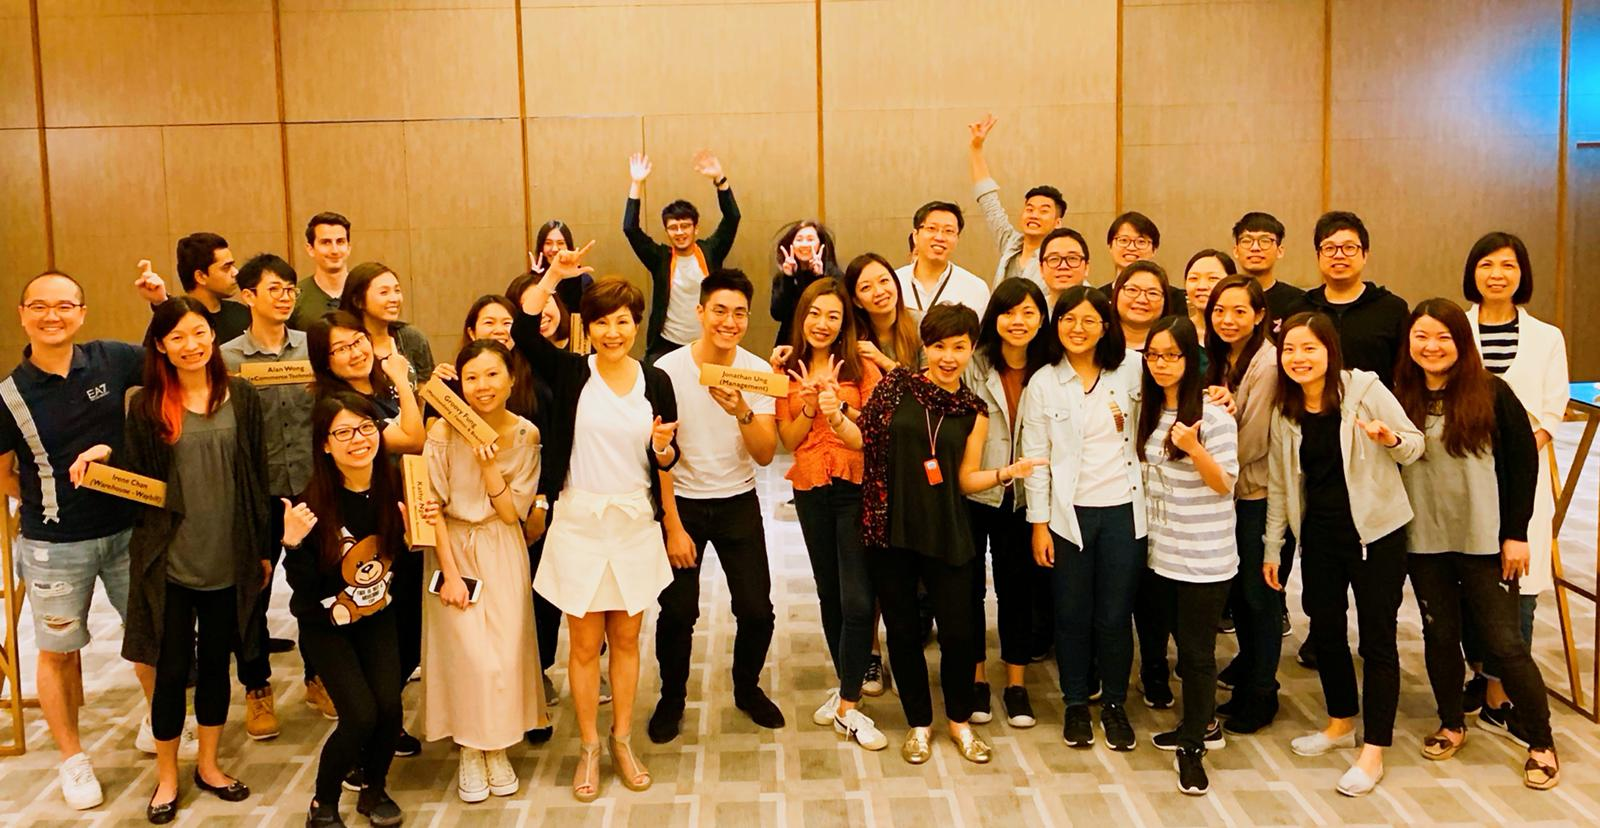 DGS Group Limited   Winning Communication Program via Enneagram, 2019